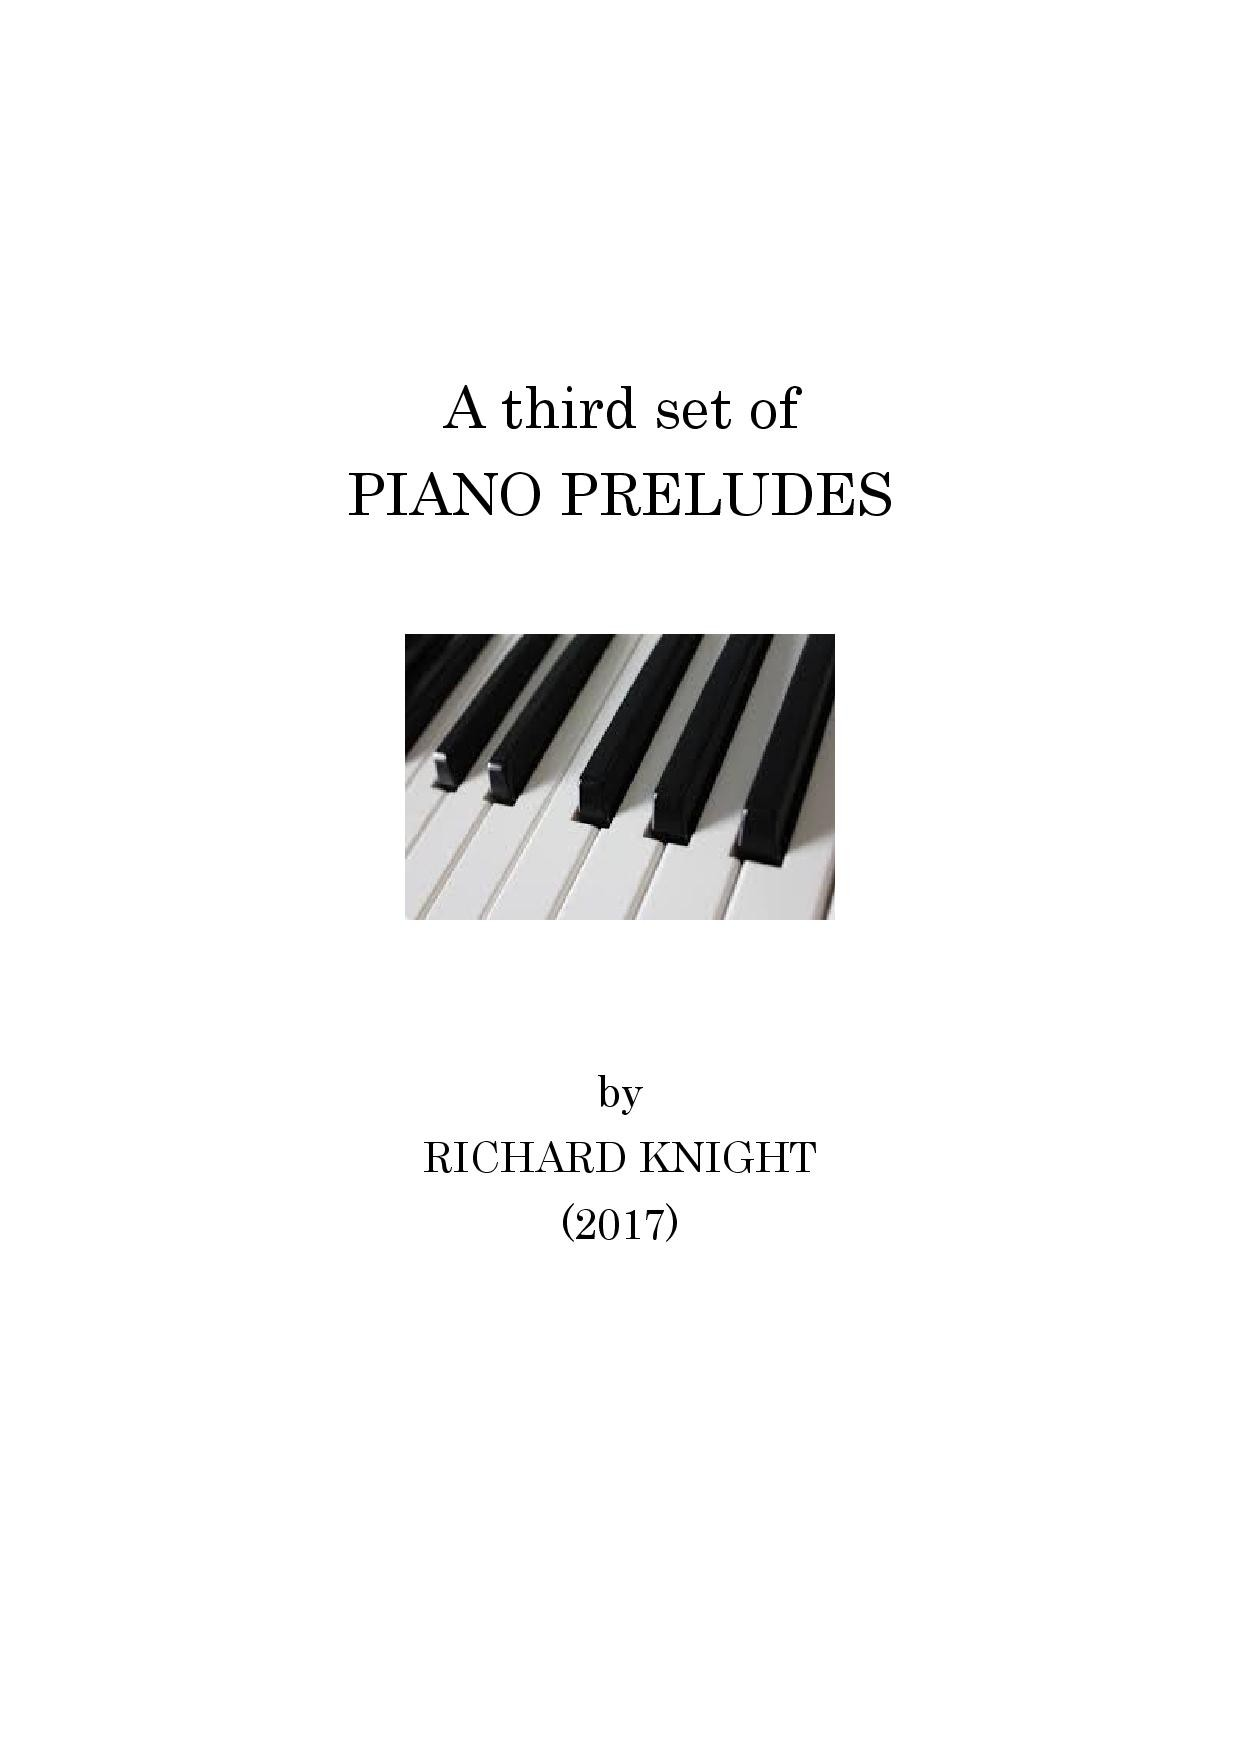 Third set of Piano Preludes